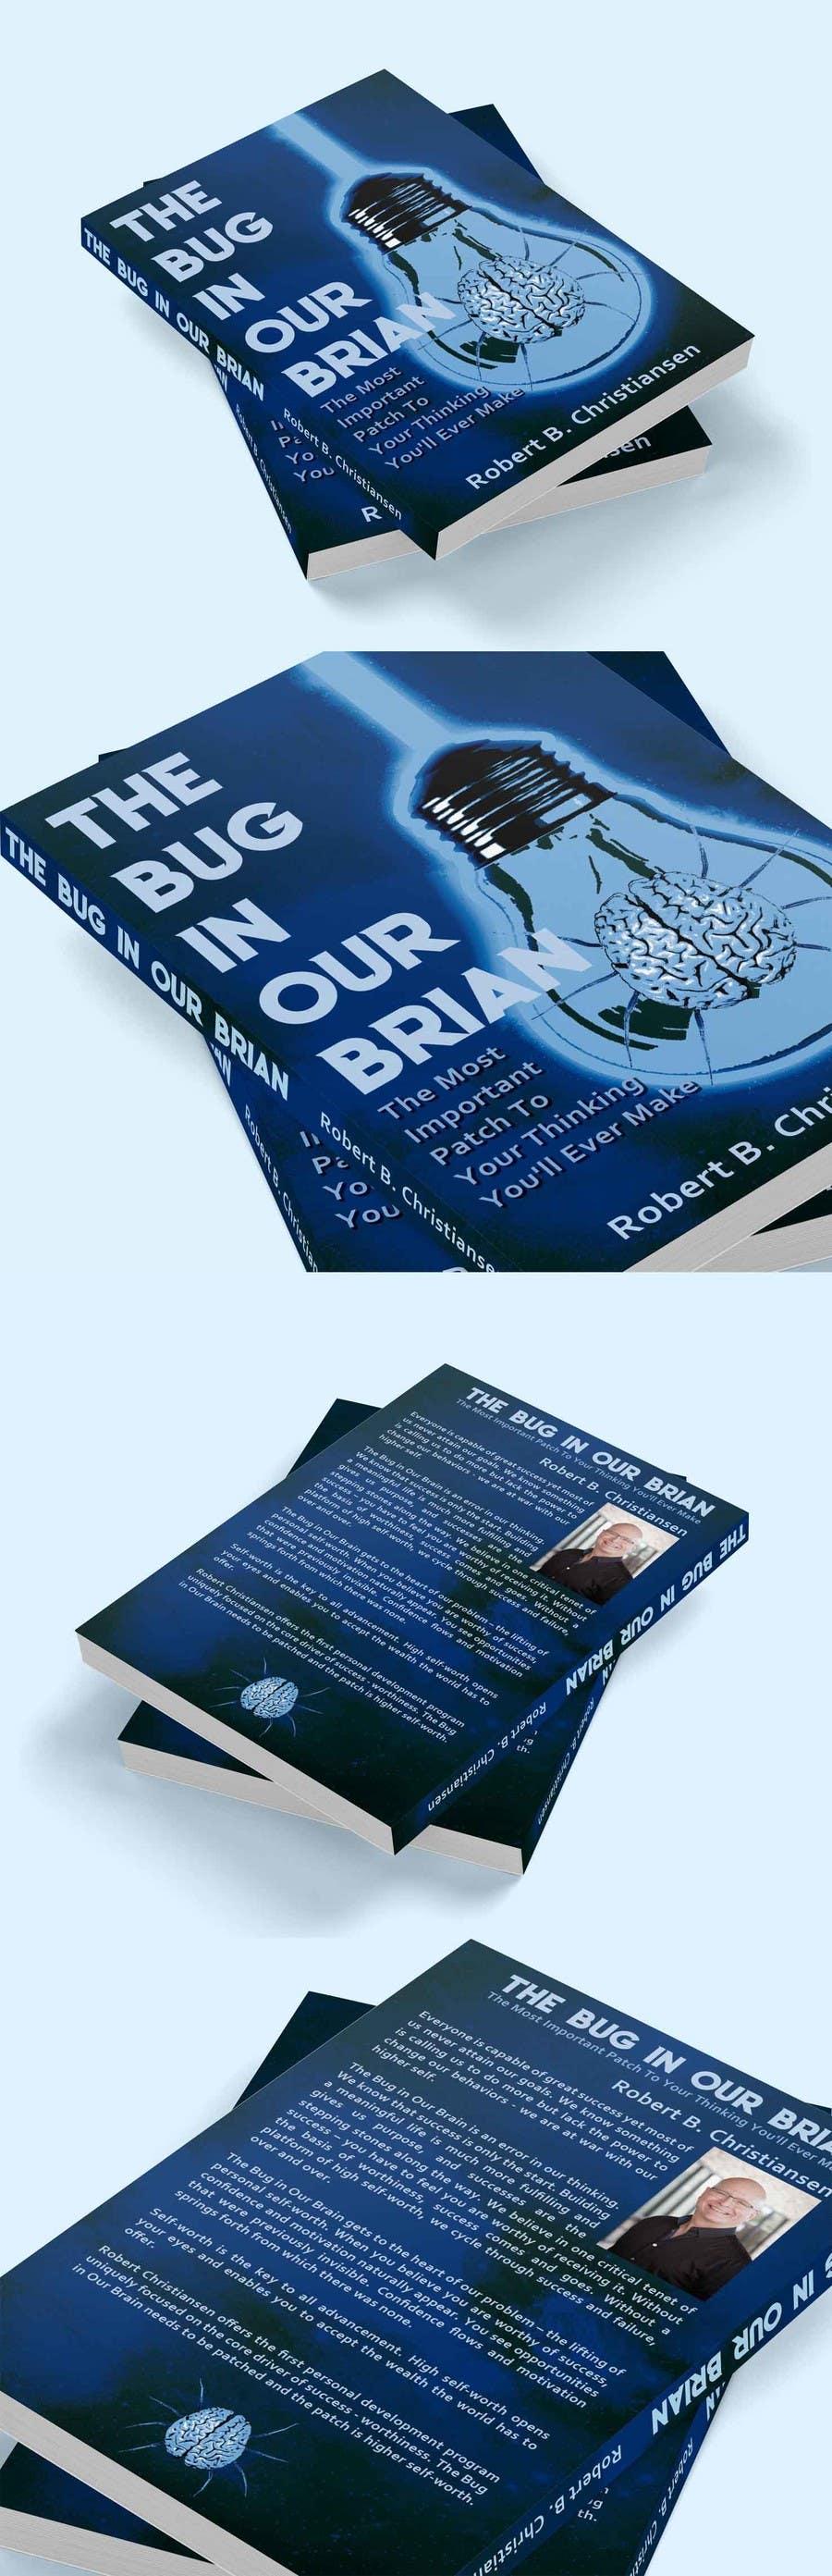 Proposition n°202 du concours Book Cover Design